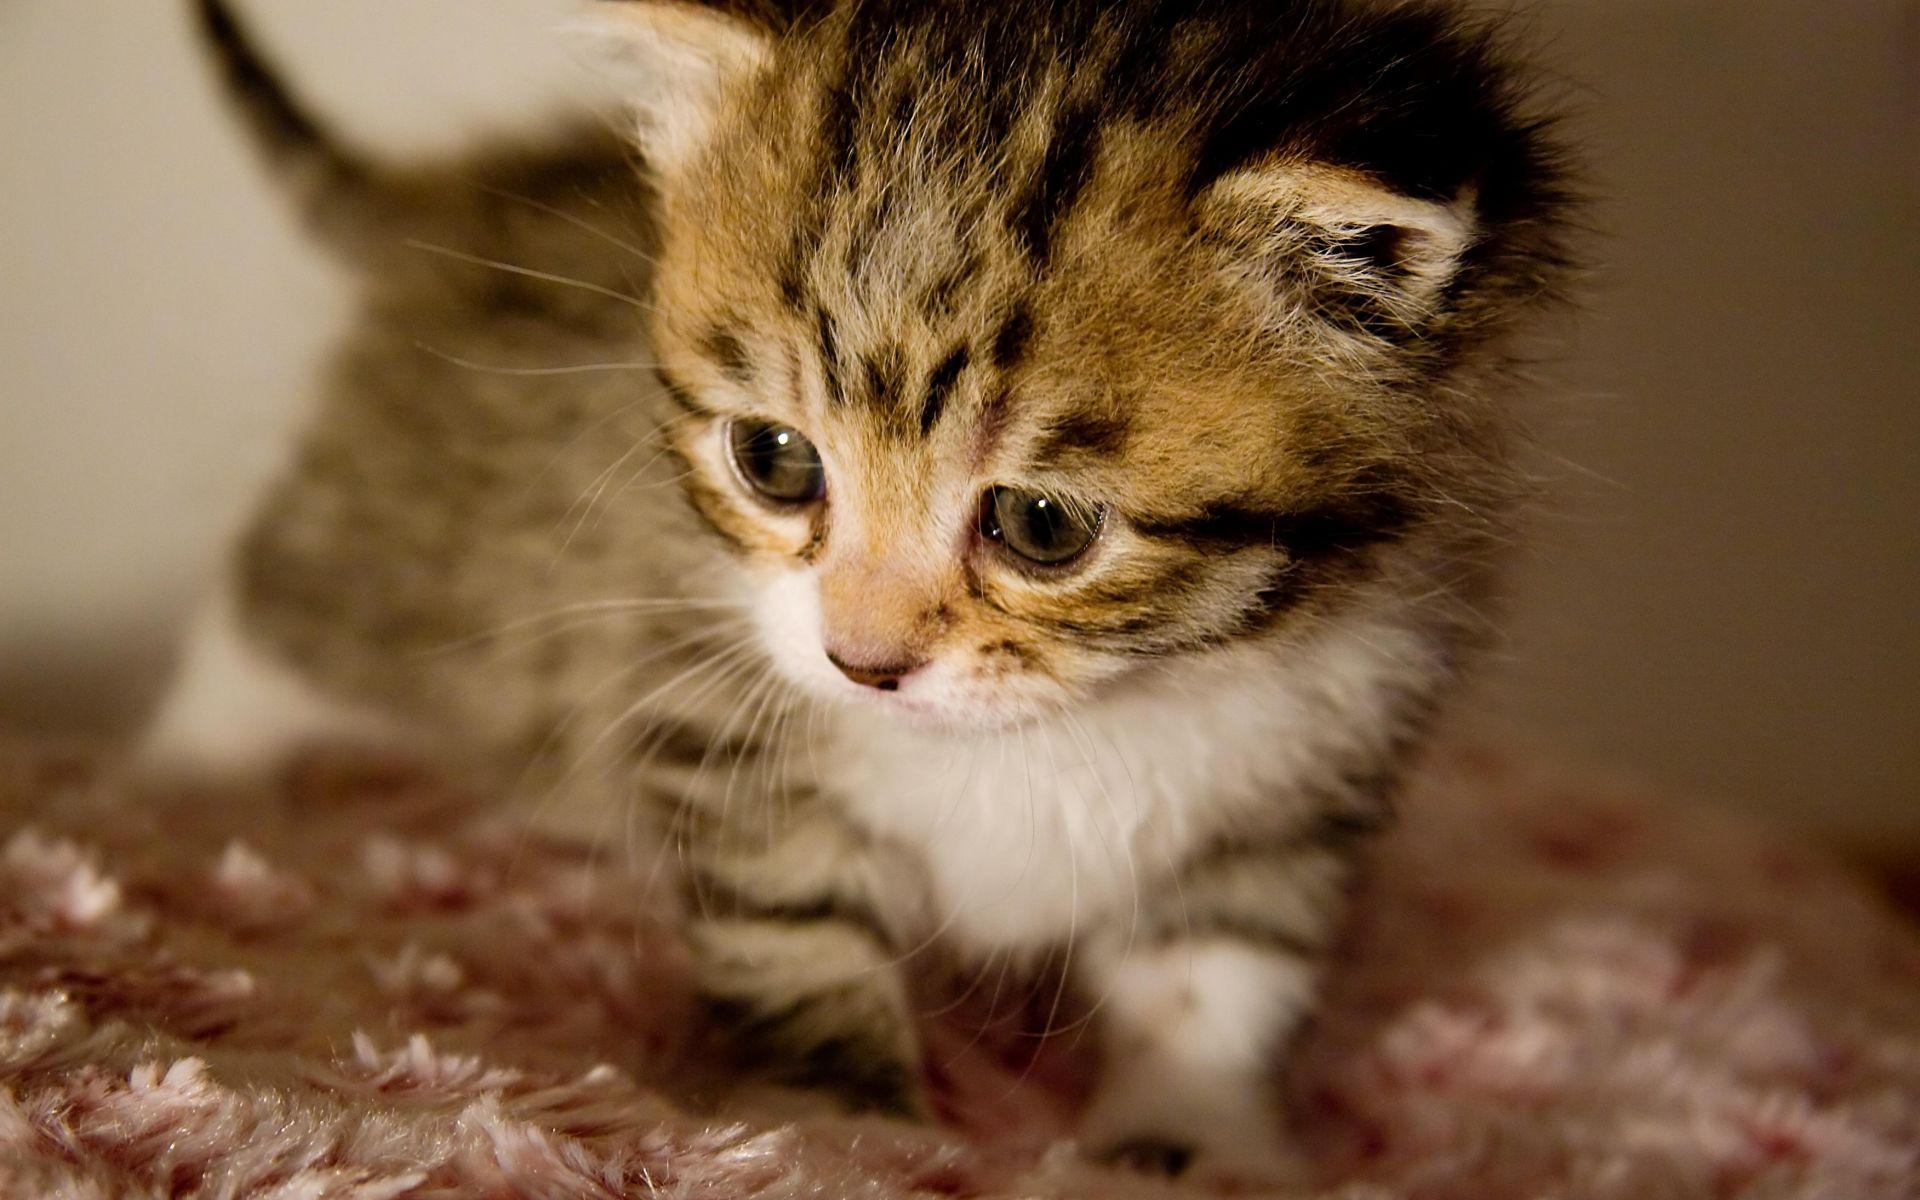 Cute kittens widescreen wallpaper widewallpapers cute little cute kittens widescreen wallpaper widewallpapers cute little kitten wallpaper wallpaper free download 1920x1200 thecheapjerseys Choice Image